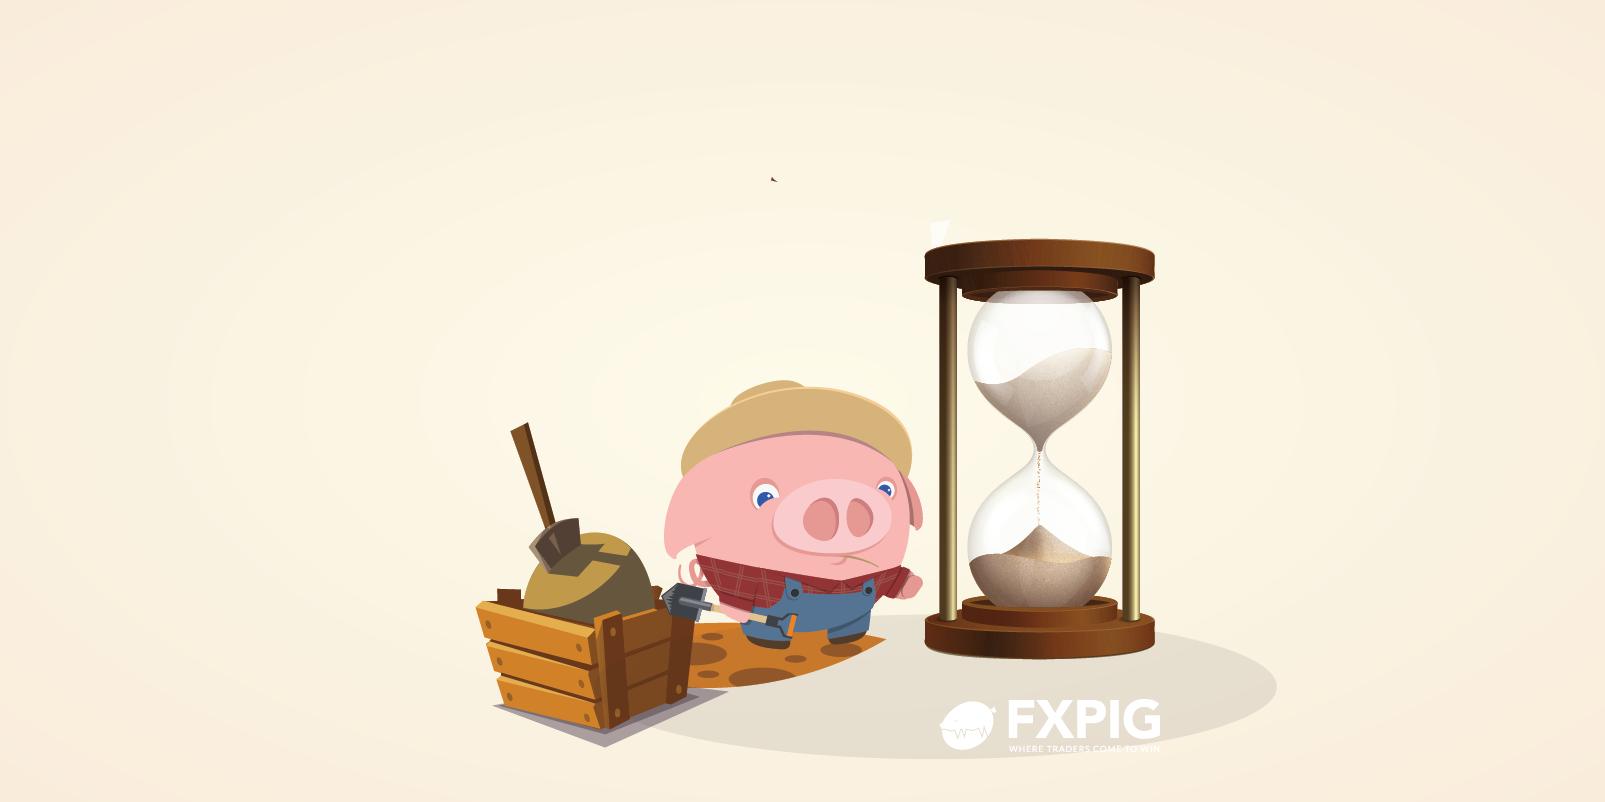 Forex_week_ahead_market-awaits_china_FXPIG